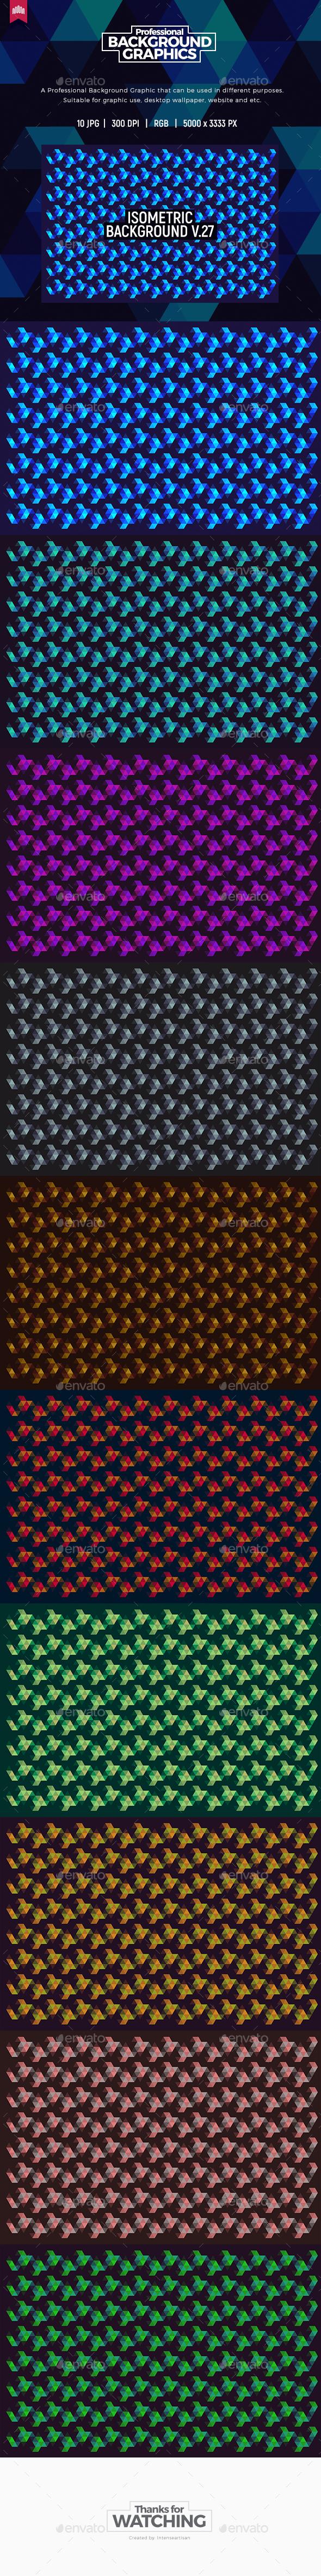 Isometric Background V.27 - Patterns Backgrounds